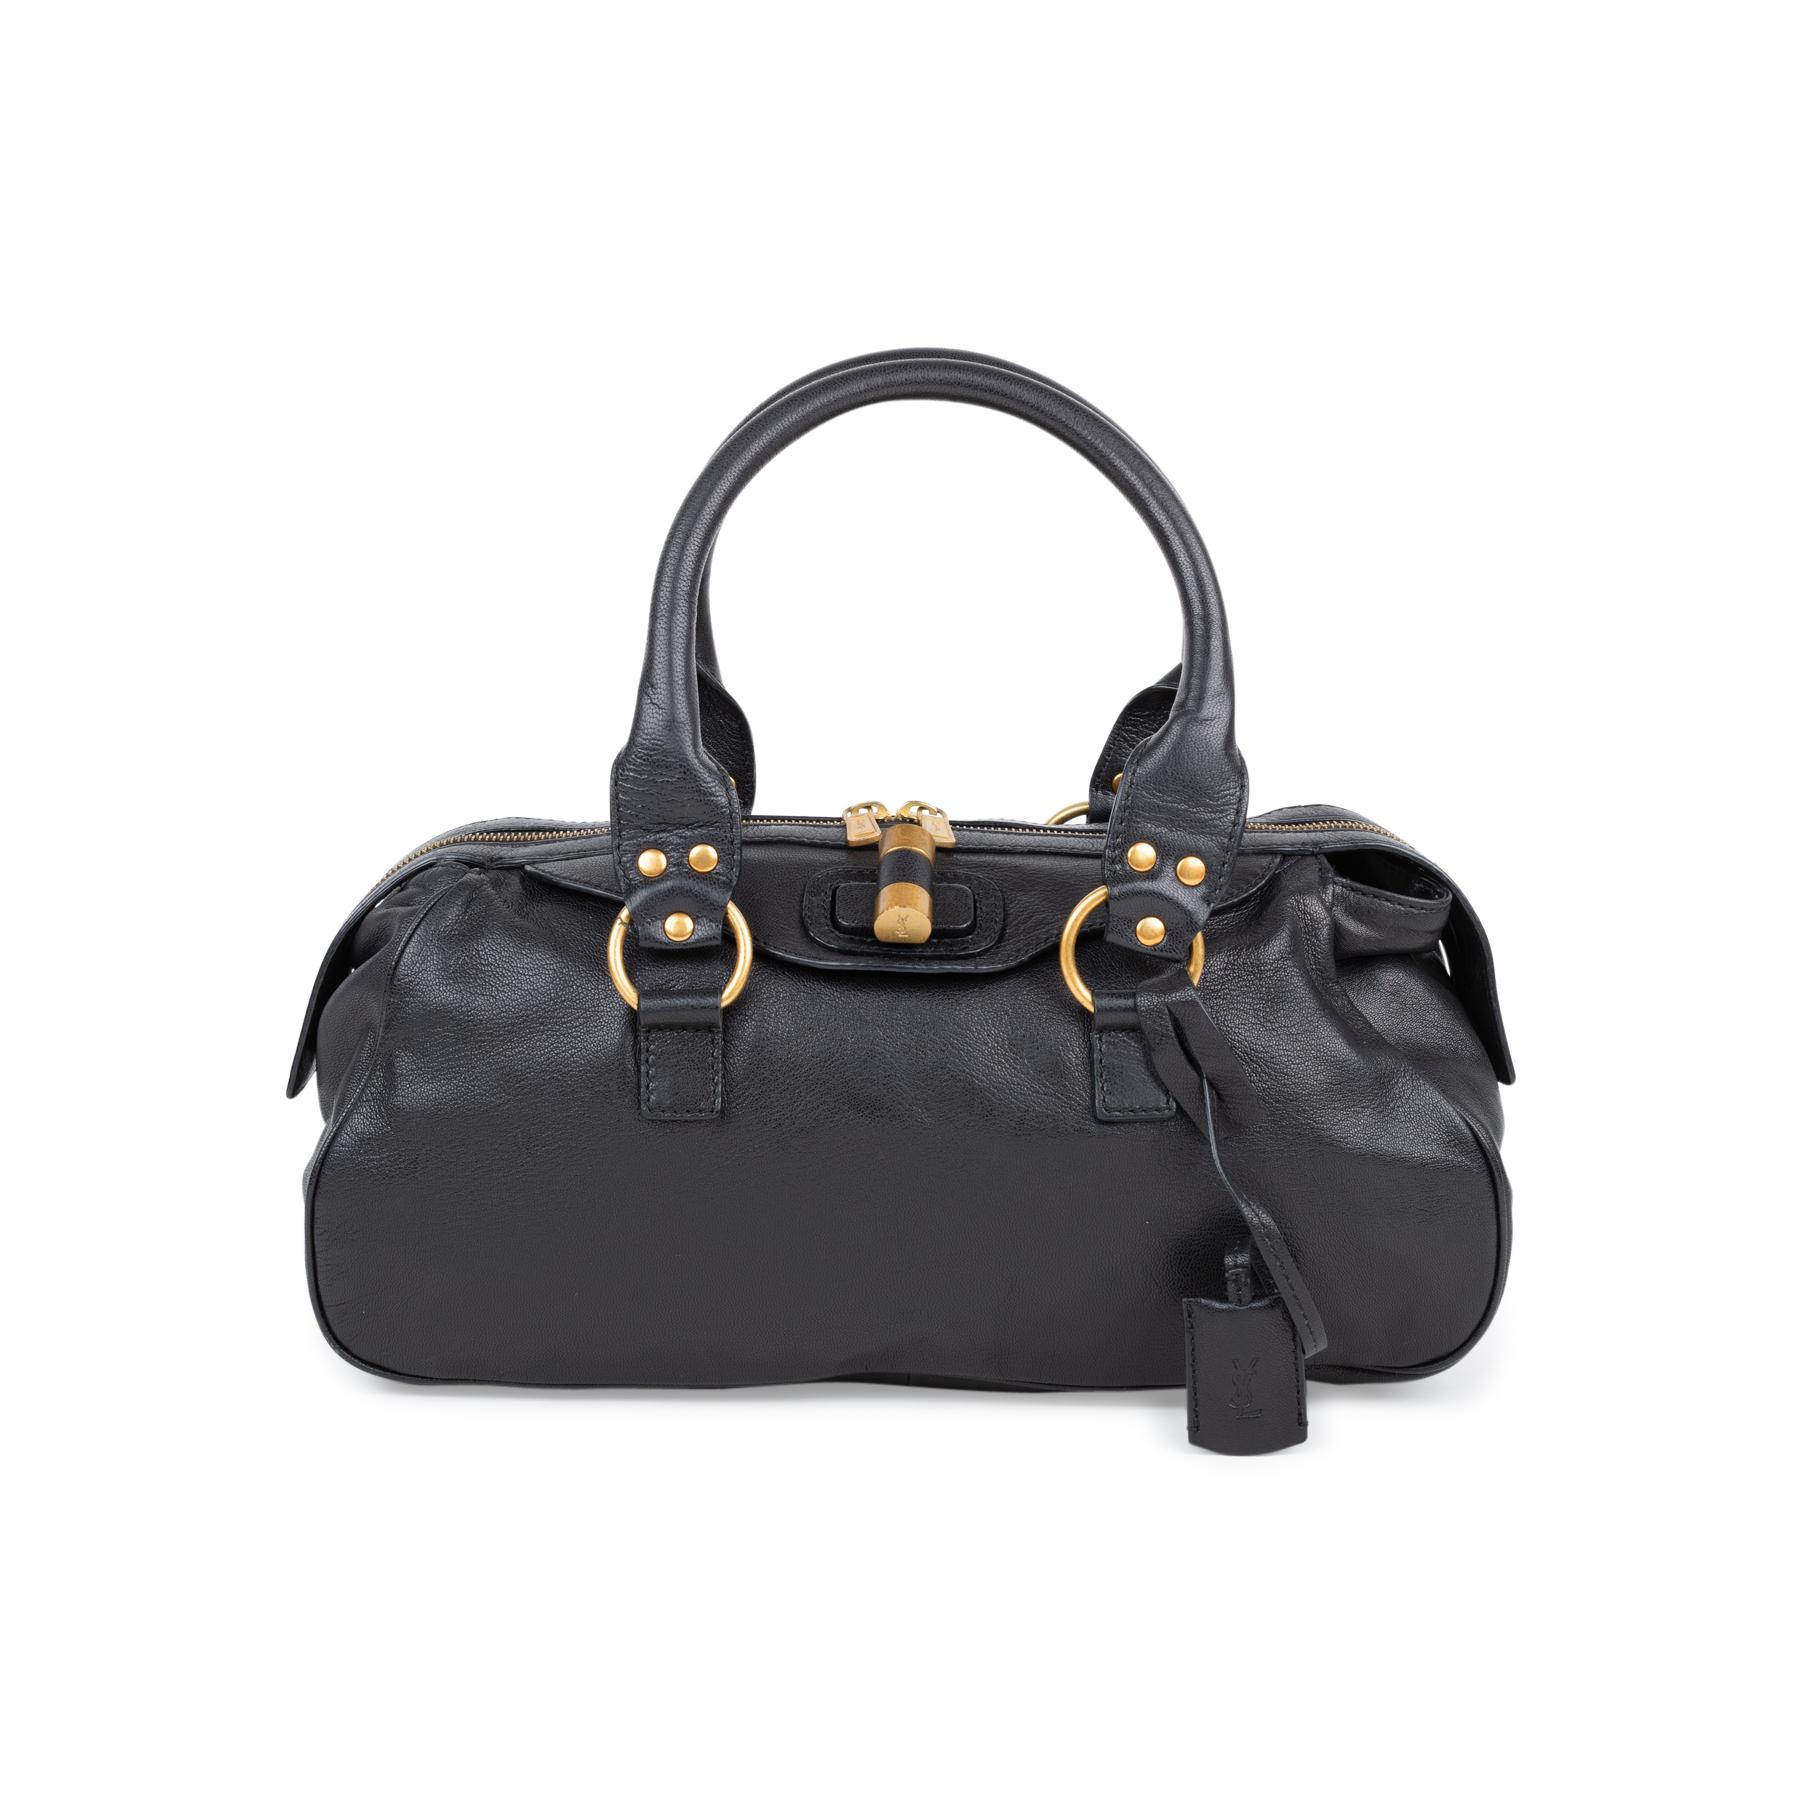 4d5a48a0b6 Authentic Second Hand Yves Saint Laurent Sac Muse Shoulder Bag  (PSS-554-00005)